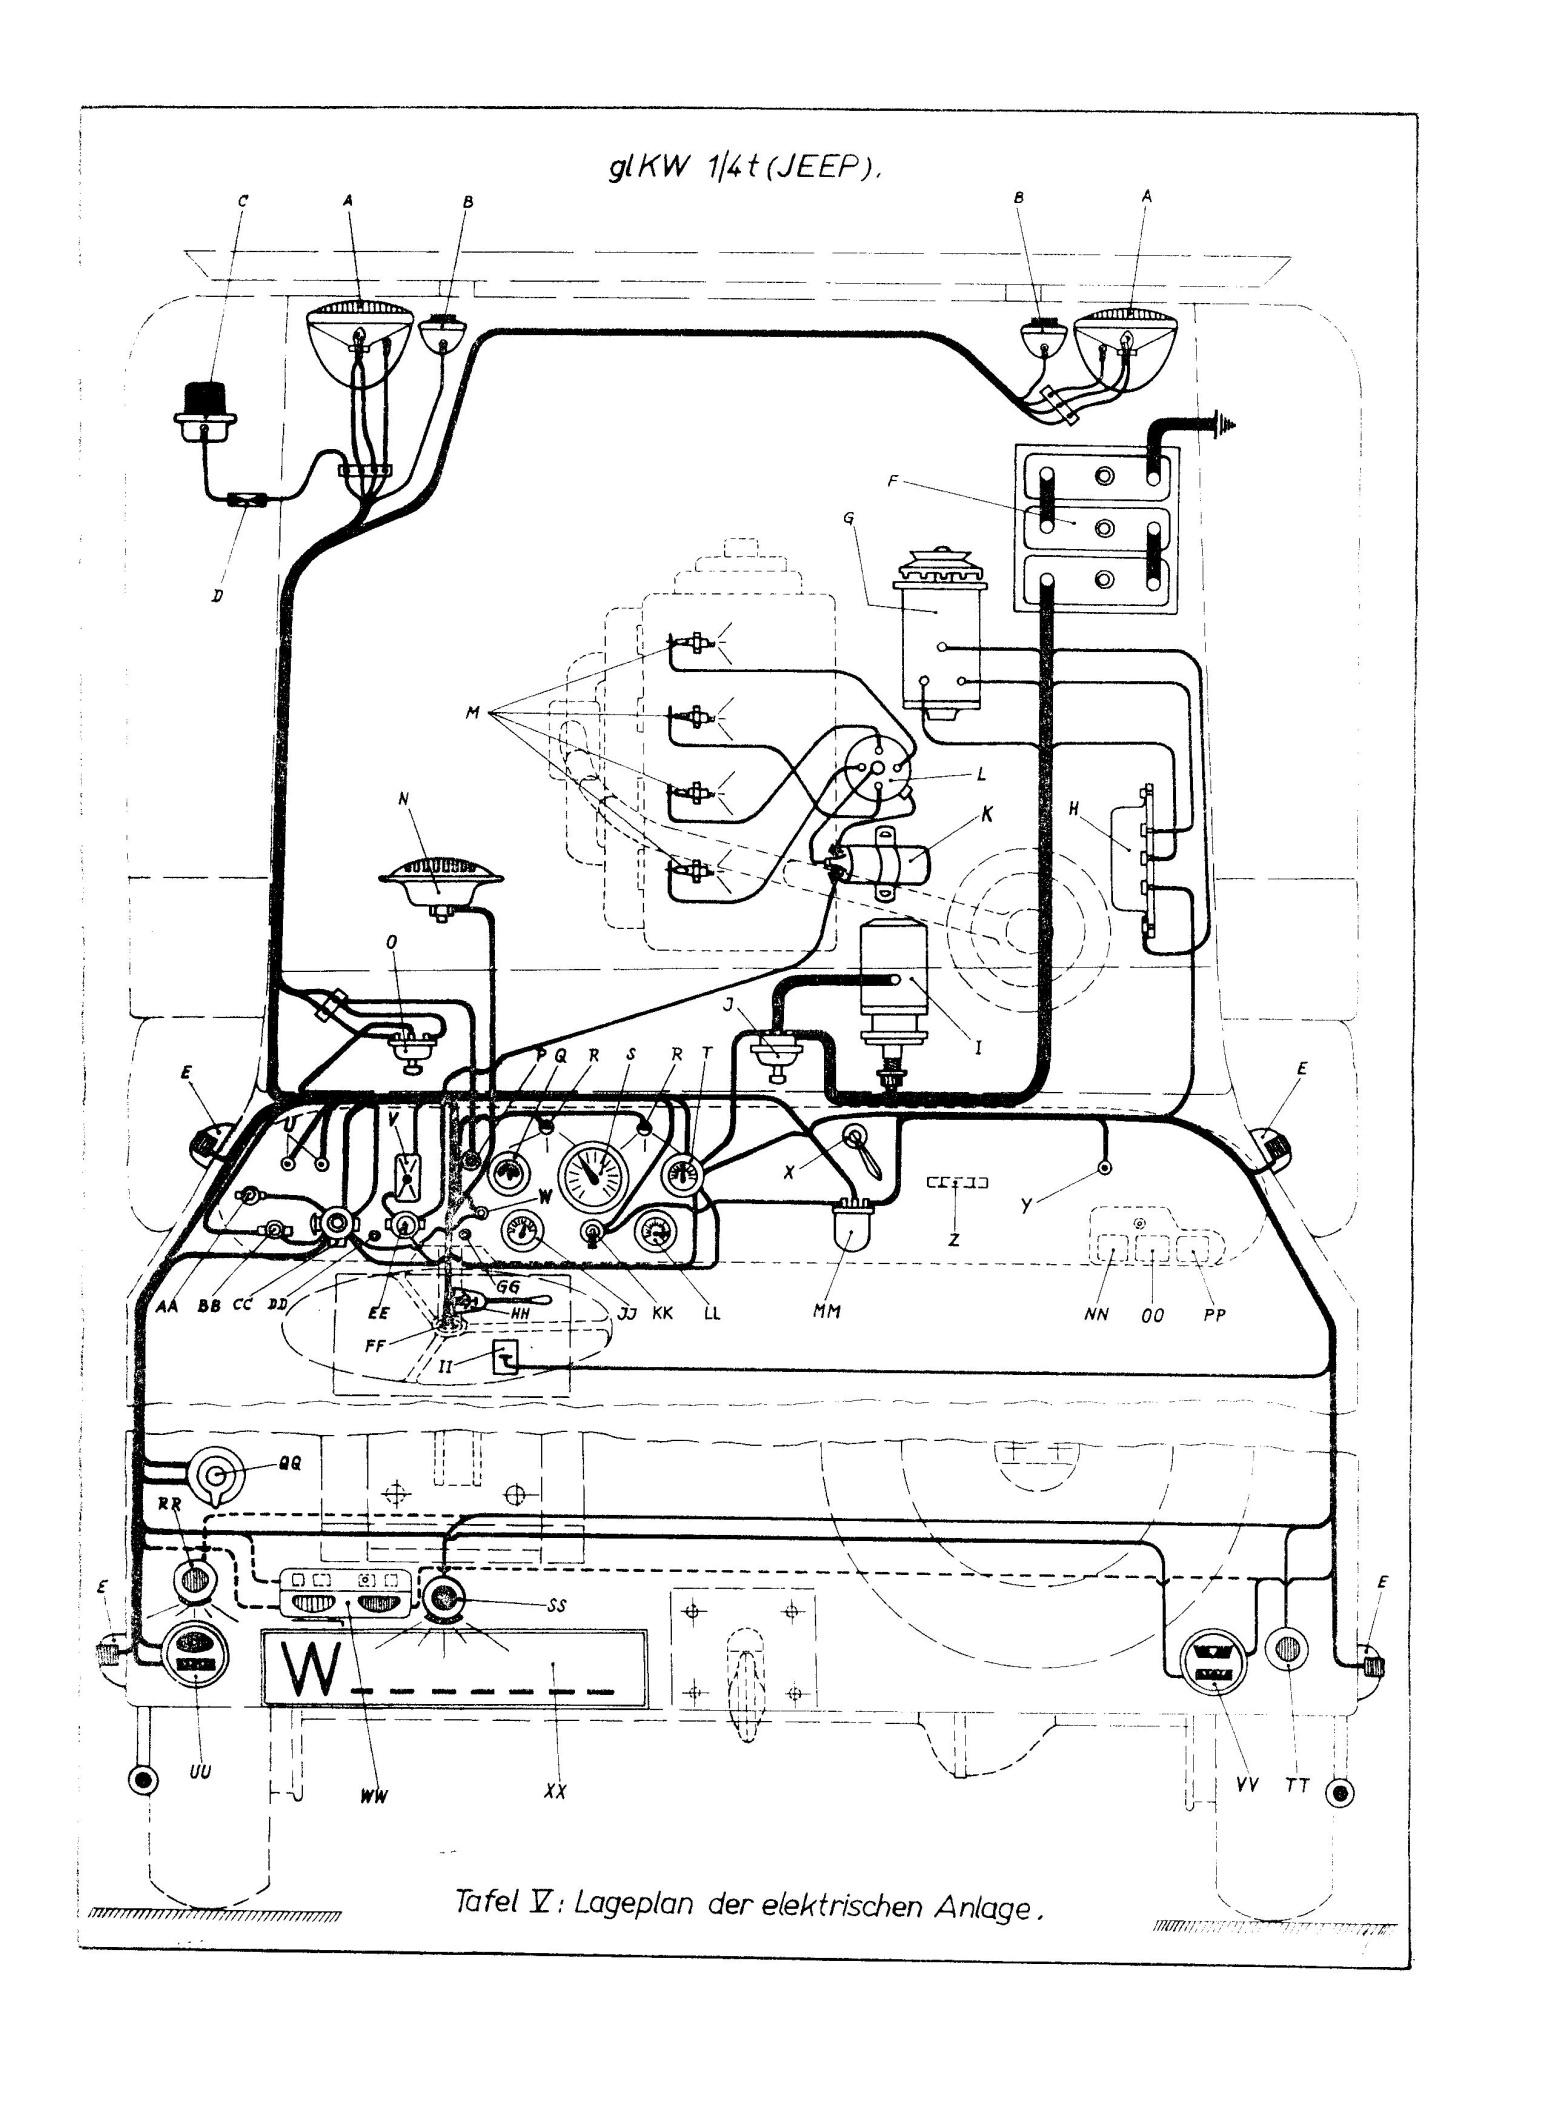 D:\Archiv Nemeth\Fzg-Gerät-Ausrüstung\Fahrzeuge\Mehrspurige Kfz\BH Fahrzeuge\Jeep\TV 9-803 Ausschnitt\Tafel V.jpeg